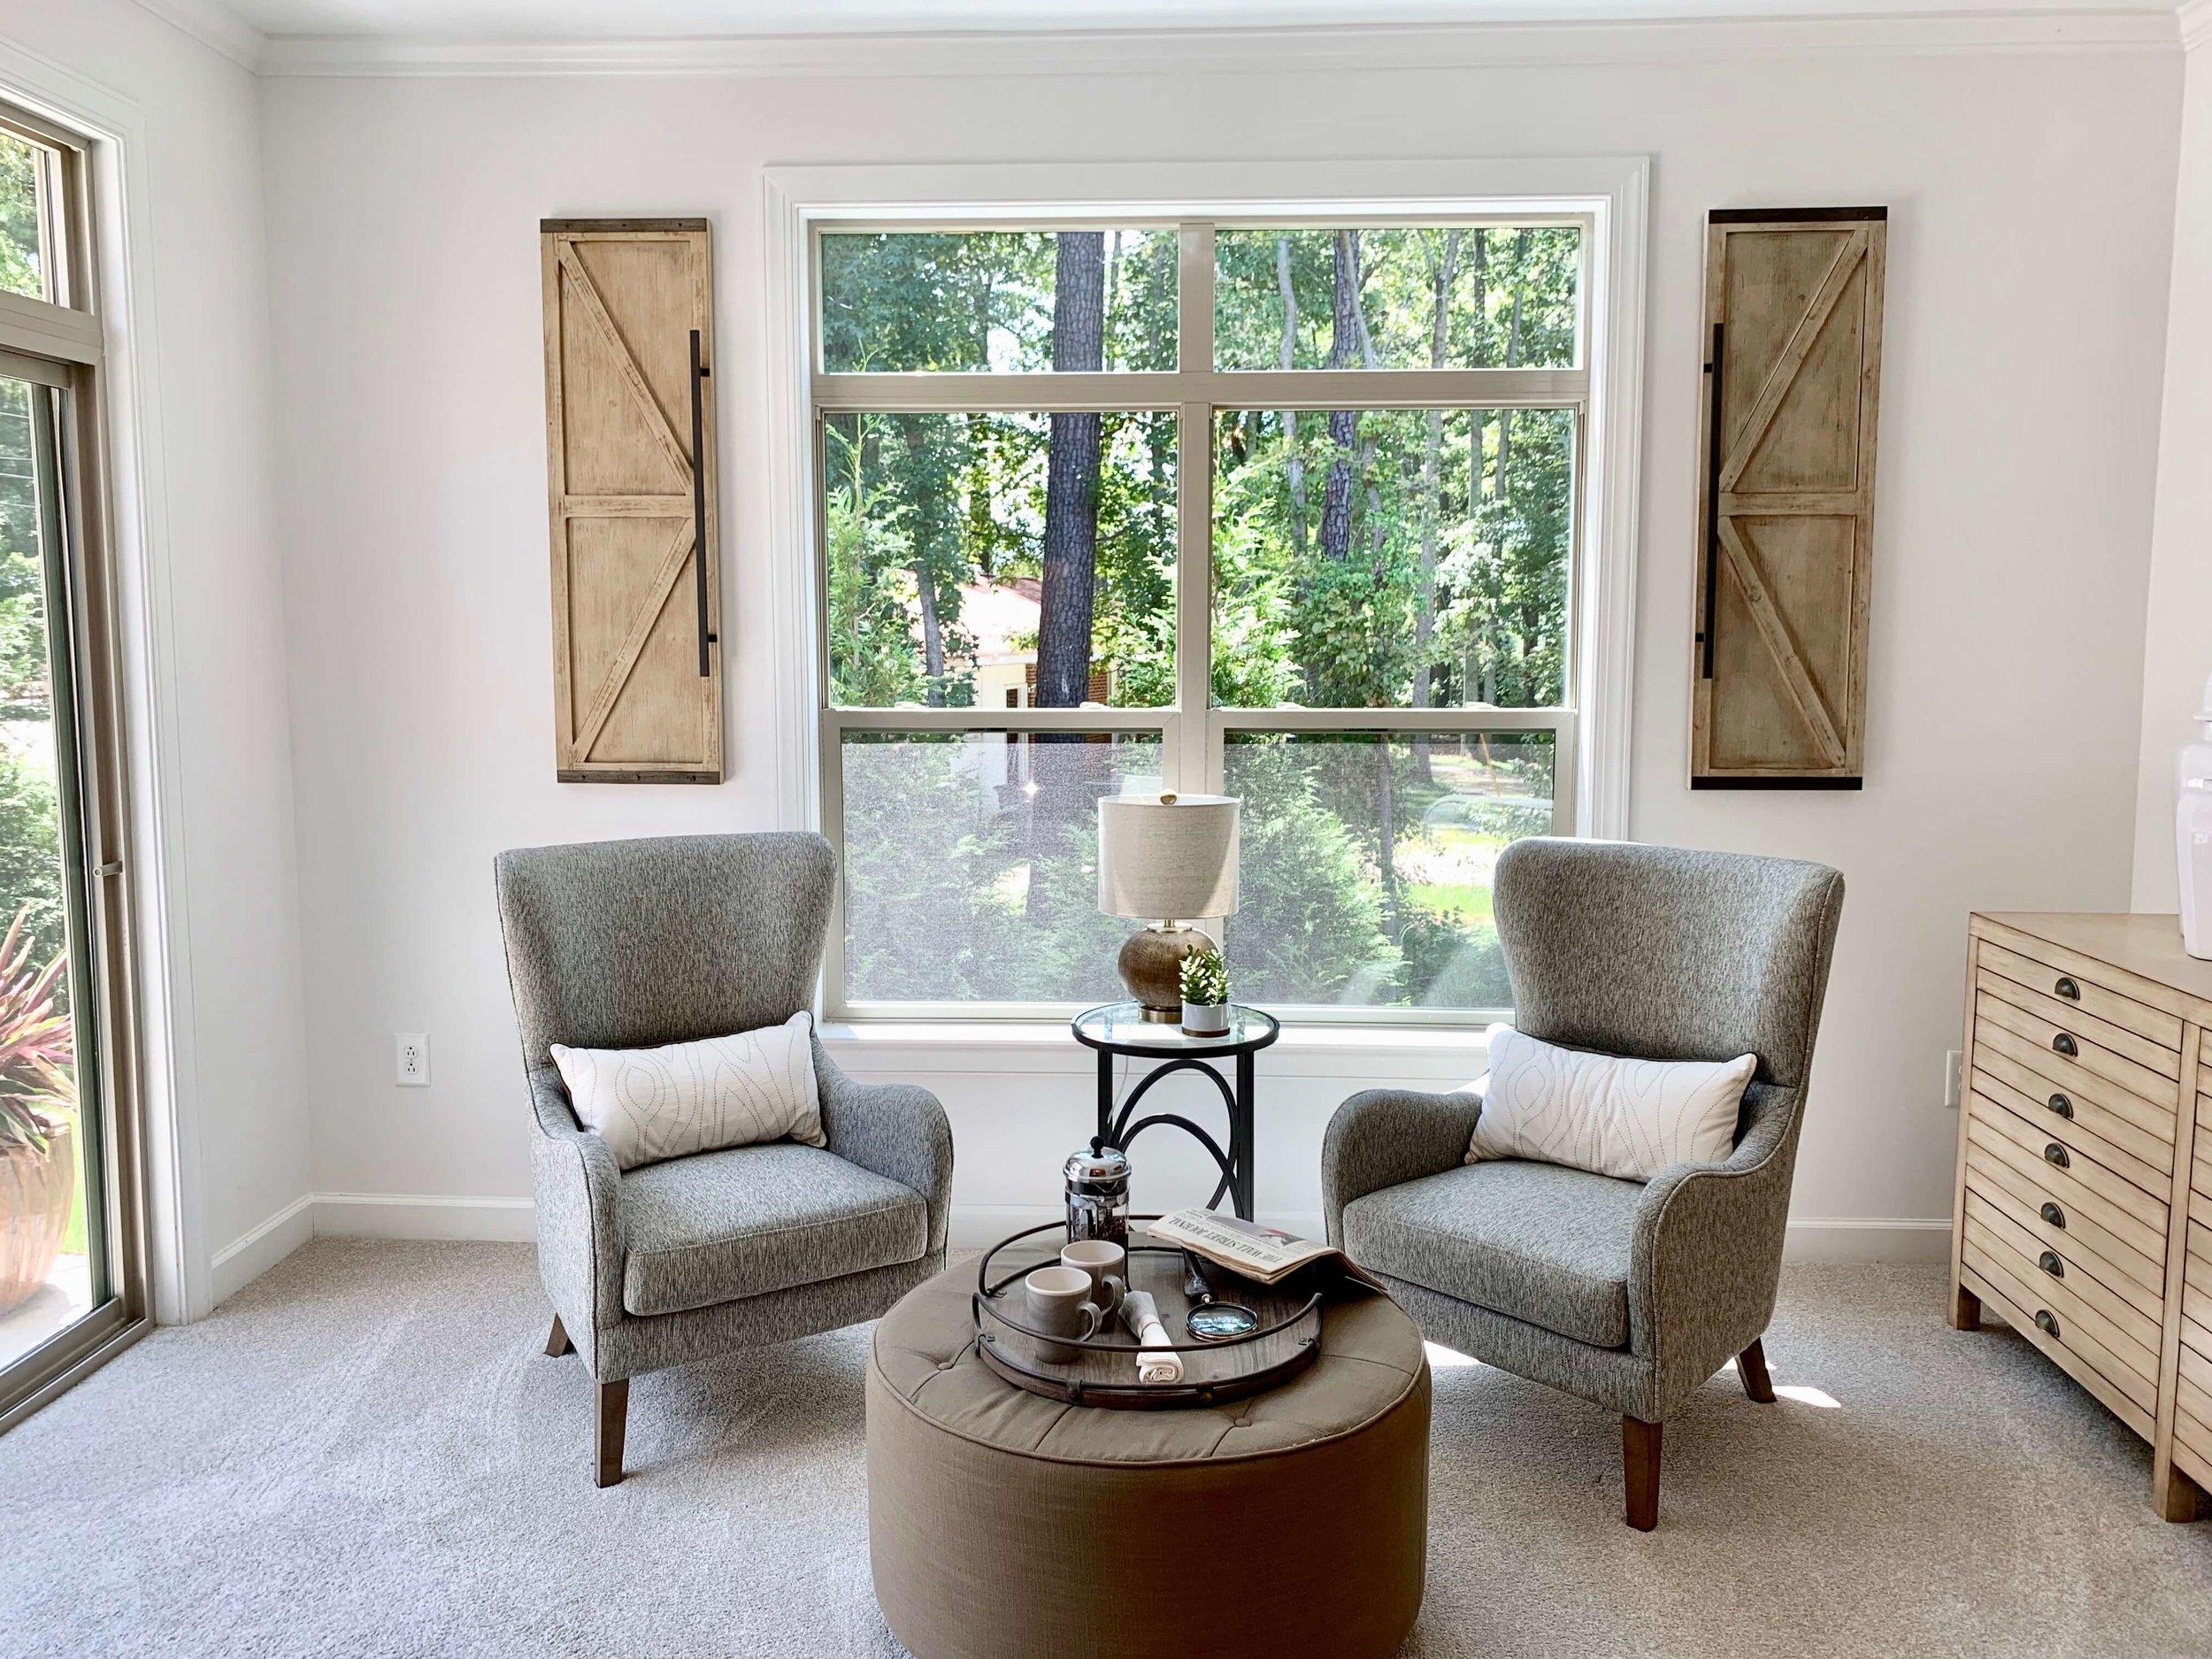 sitting_room_home_decor_ideas_model_home_inspiration.jpeg